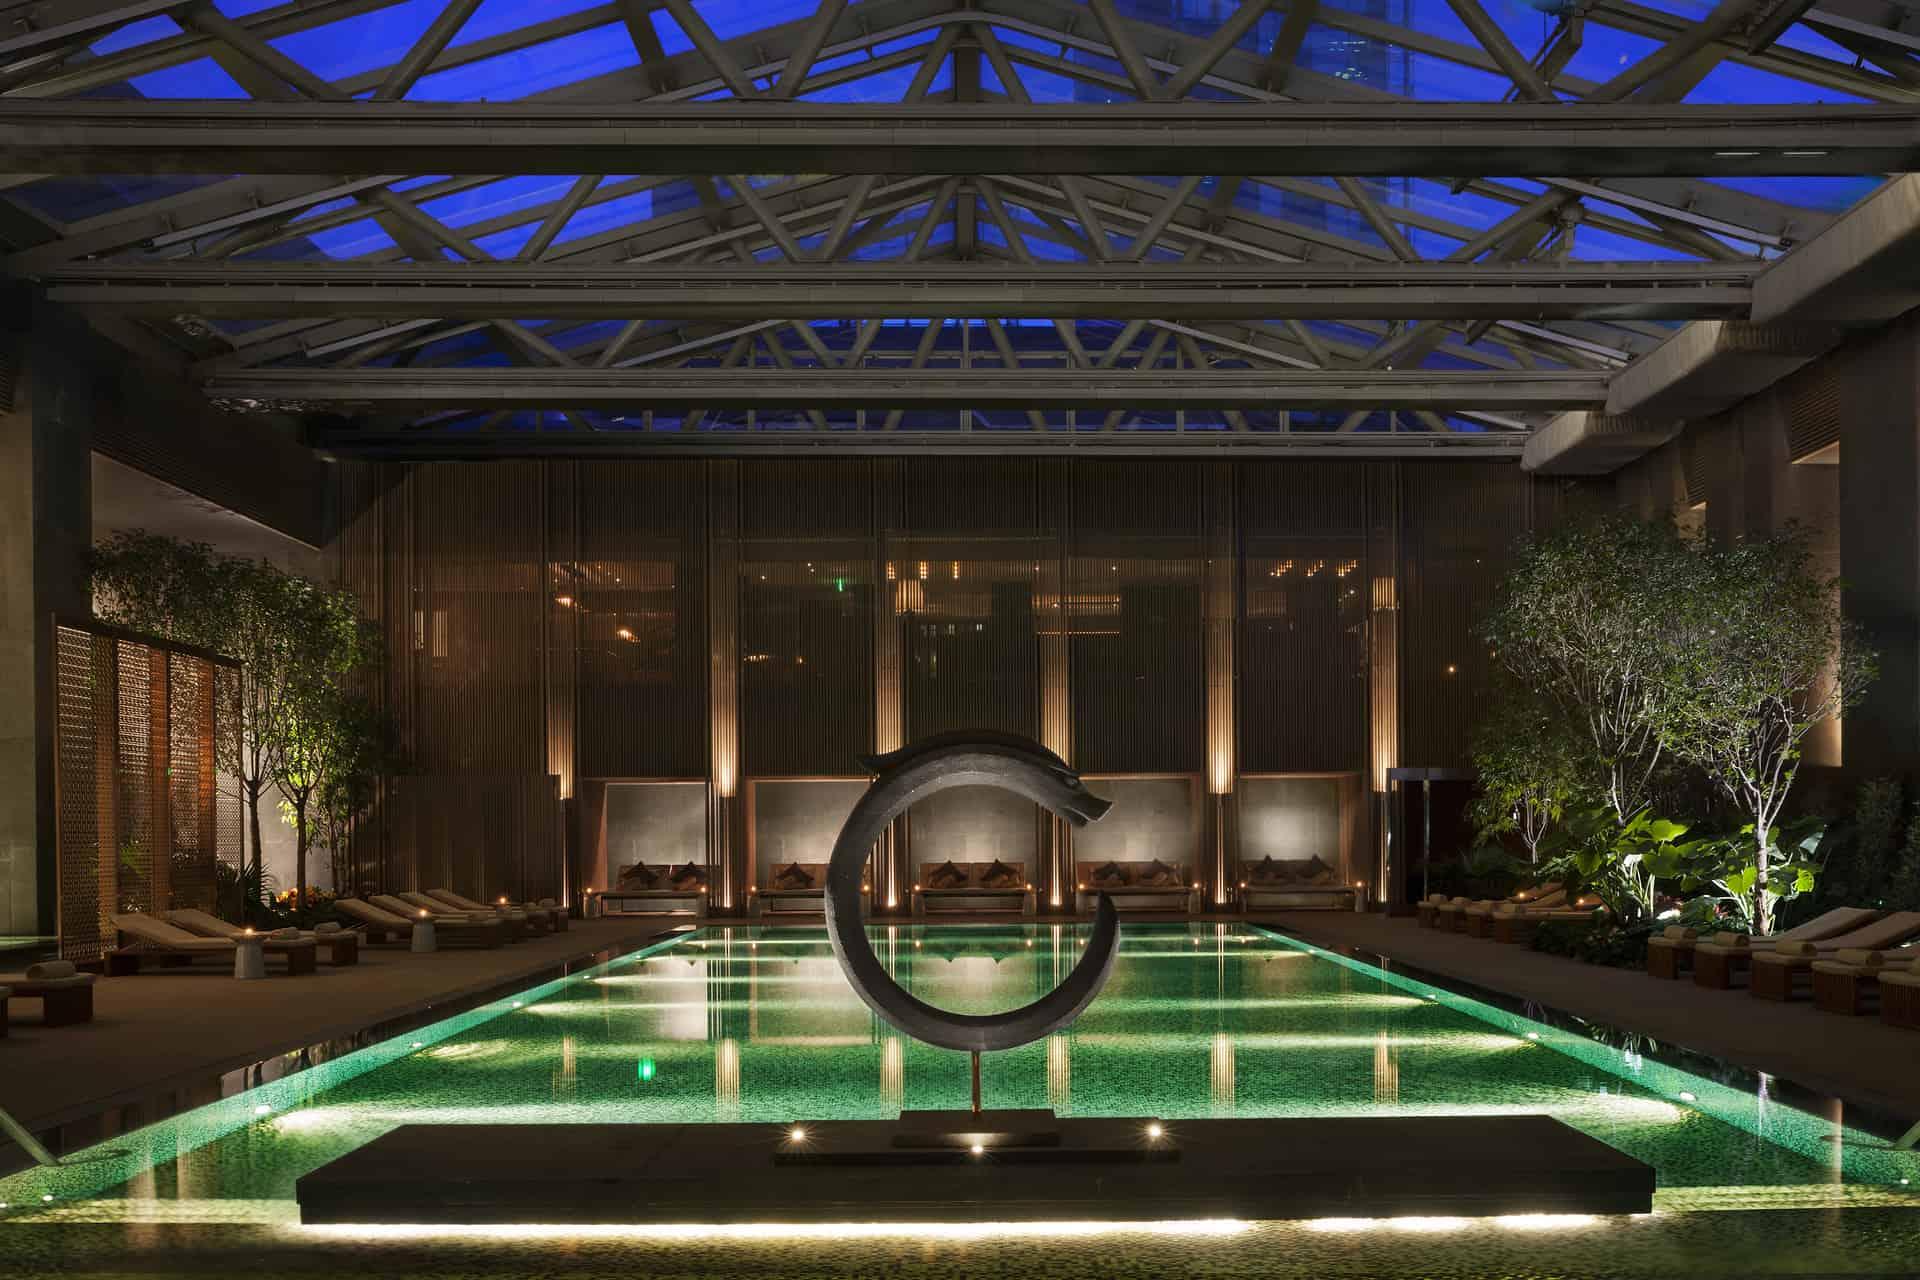 Rosewood Beijing Night Pool View